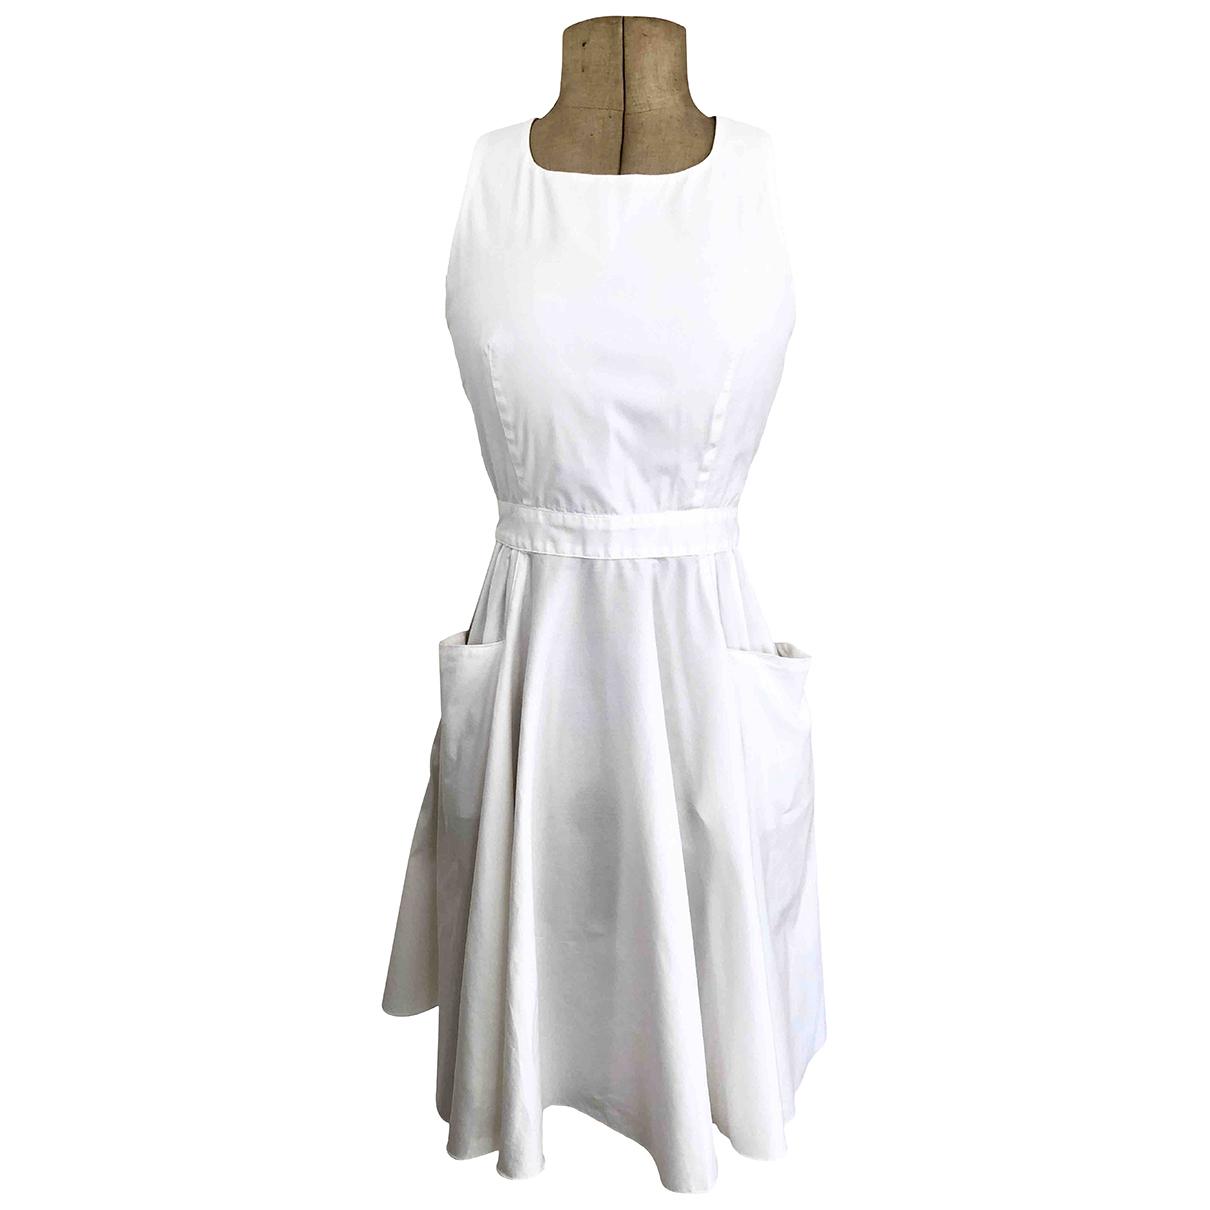 Prada \N White Cotton dress for Women 40 IT